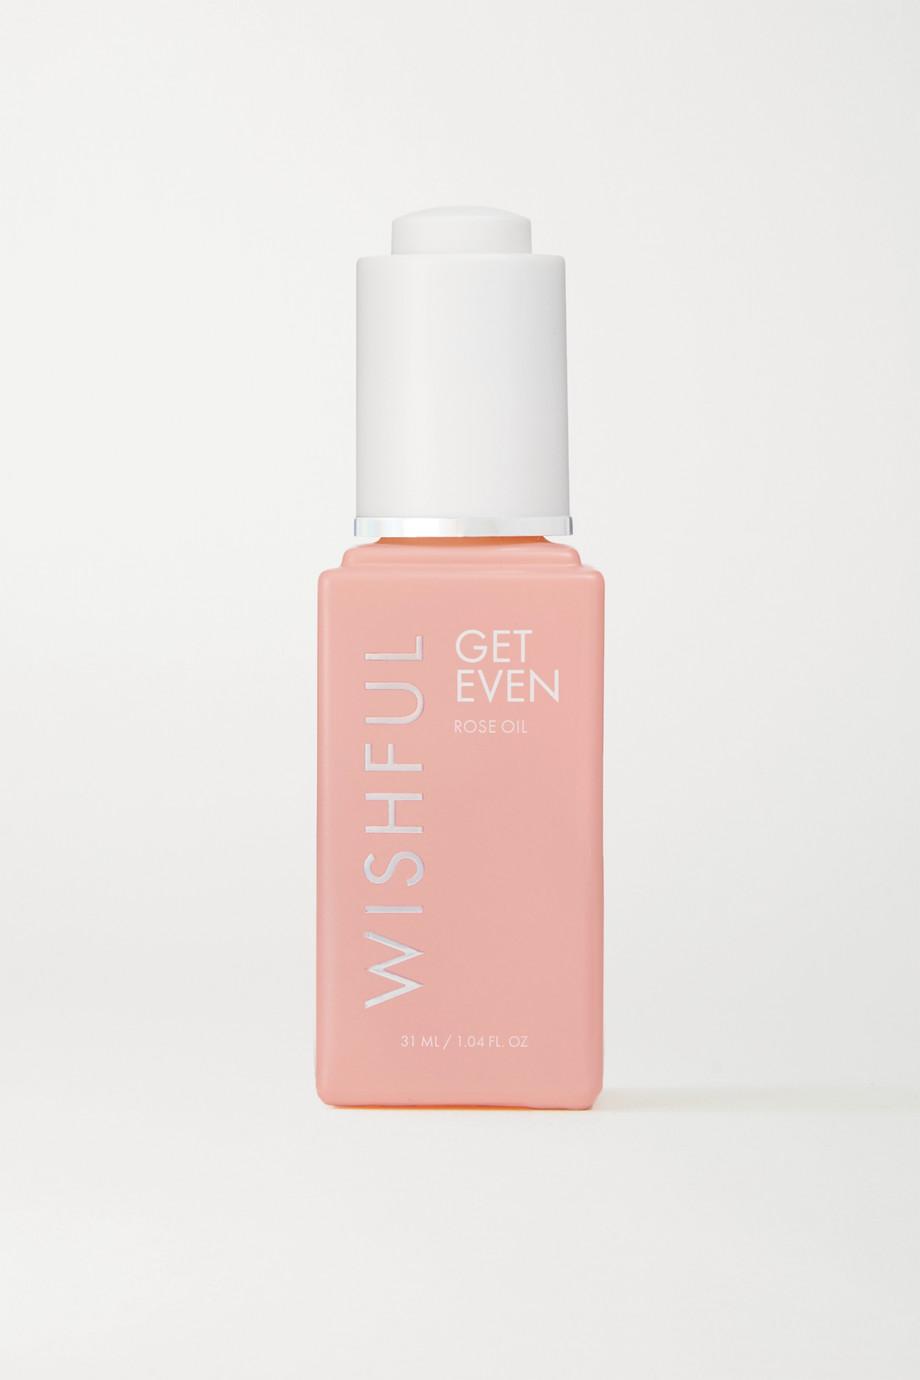 Huda Beauty Wishful Get Even Rose Oil, 31ml